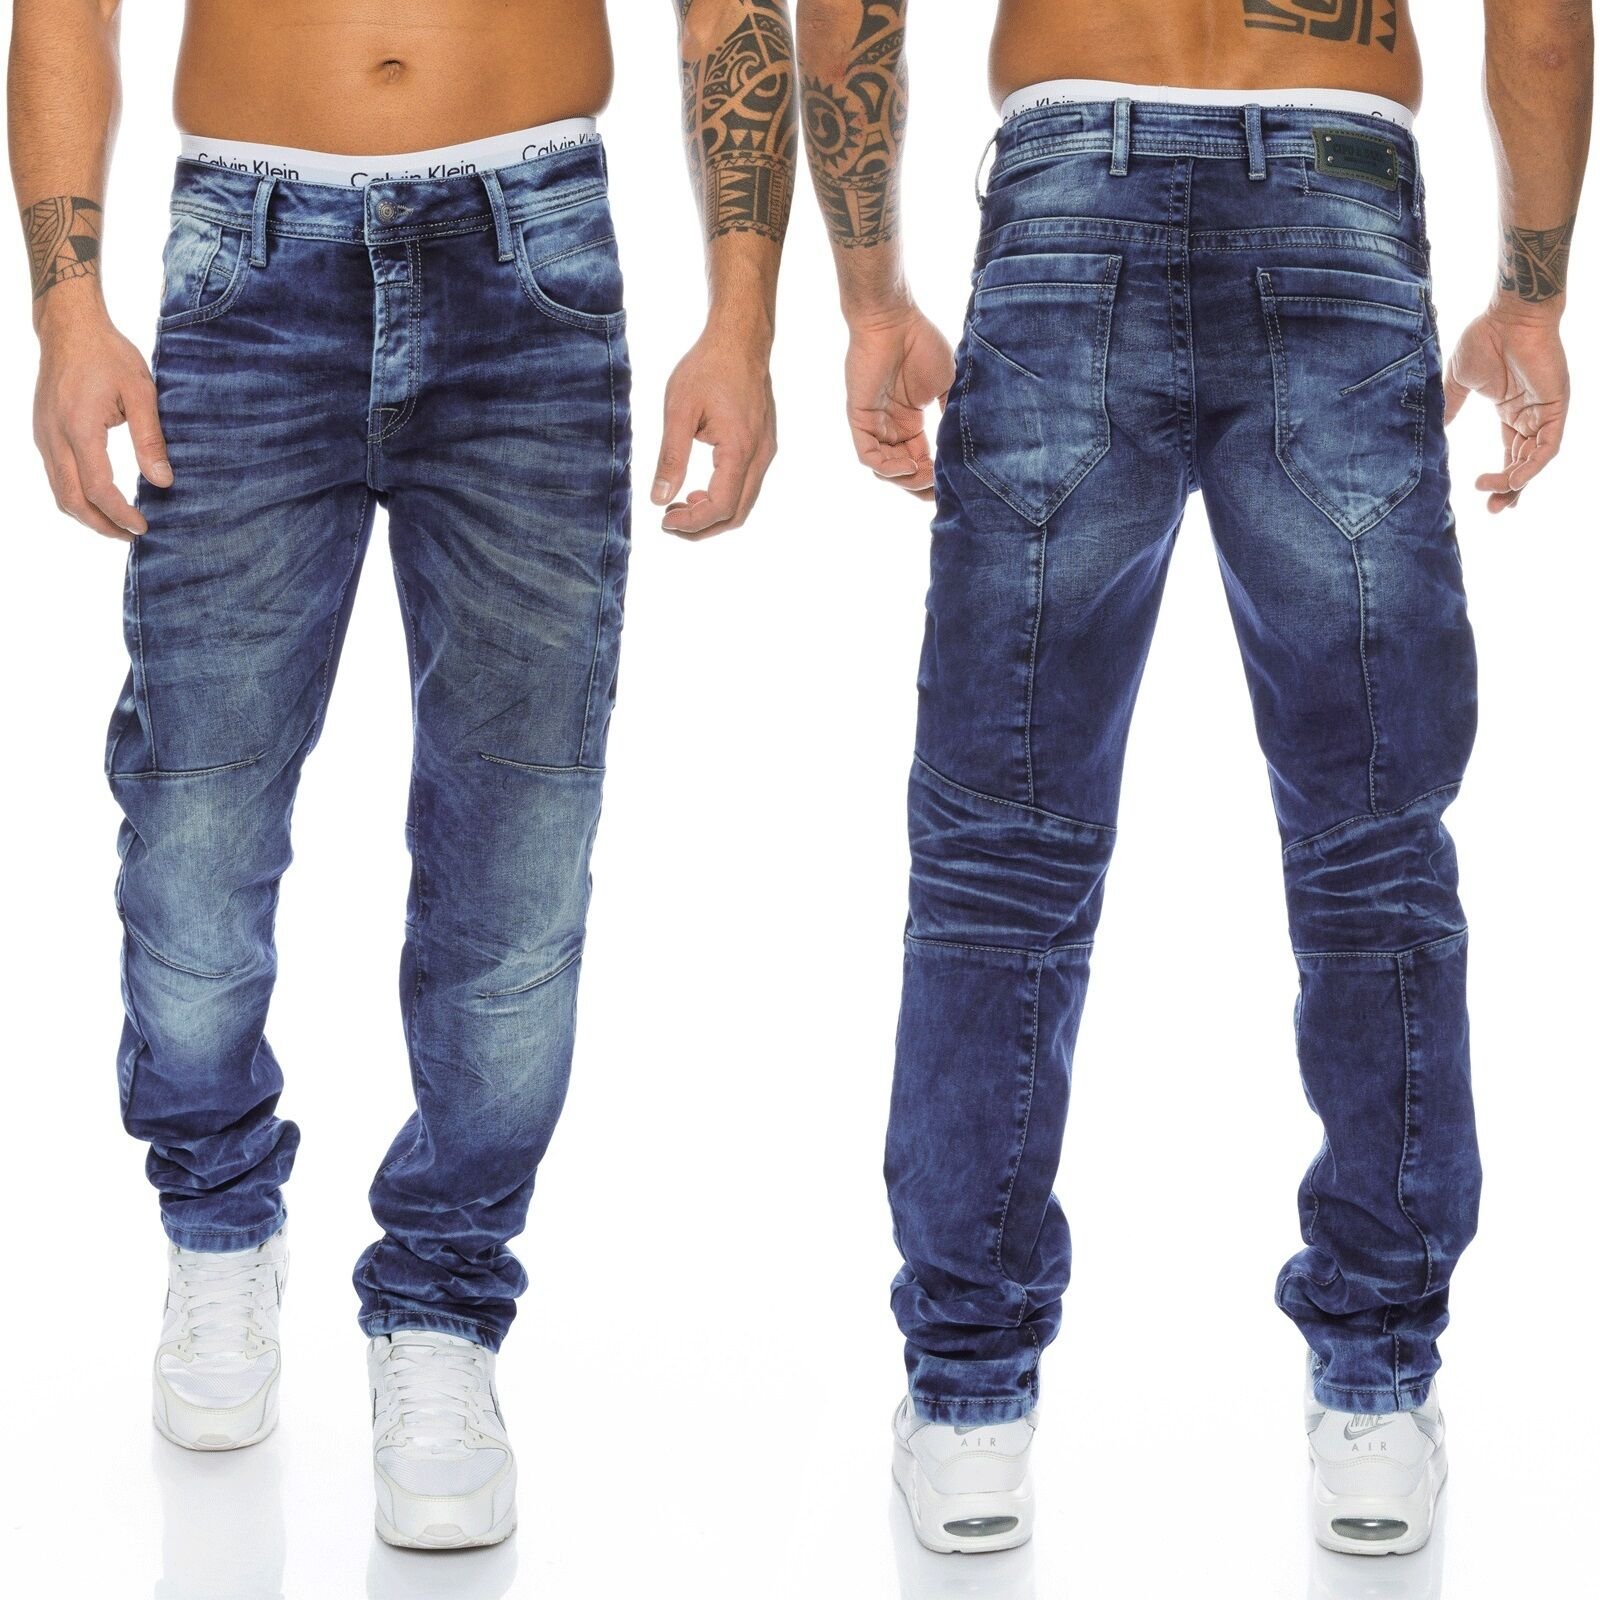 Cipo & Baxx Uomo Denim Jeans Pantaloni 286 BLU NUOVO w28 29 30 31 32 33 34 36 38 40